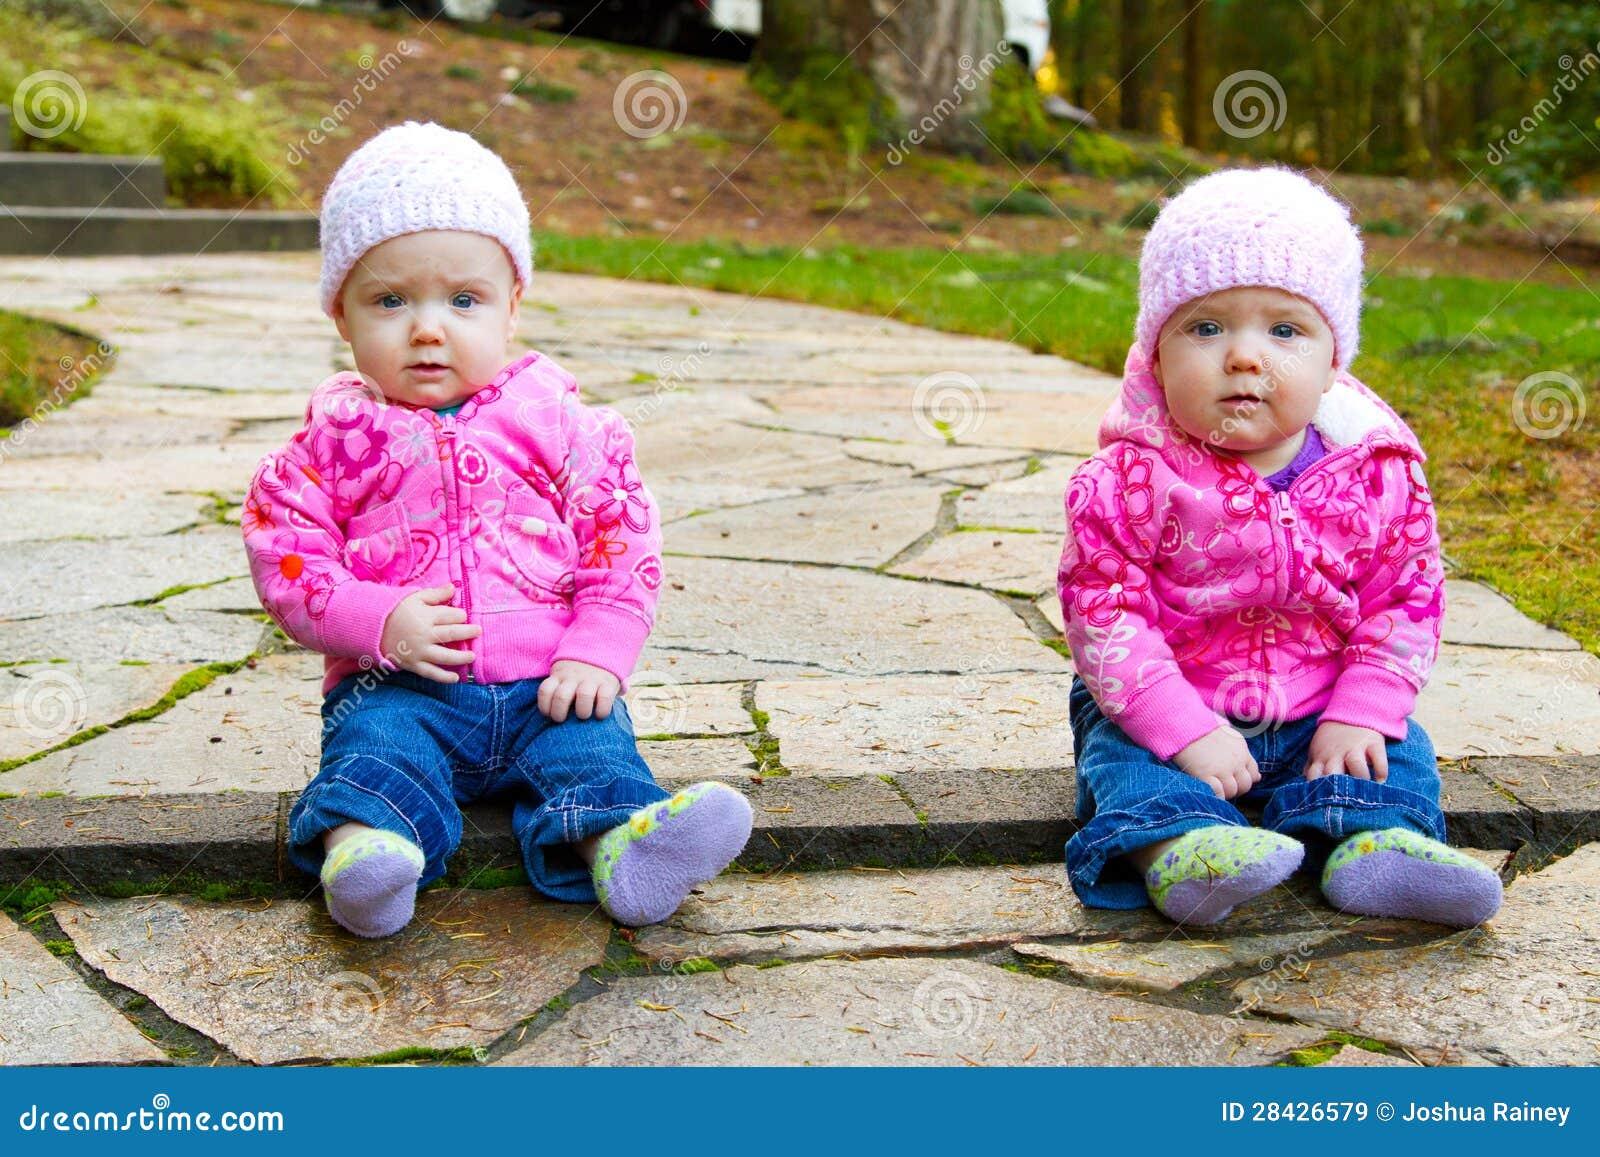 family of 3 photo poses ideas - Meninas Gêmeas No Rosa Imagens de Stock Royalty Free